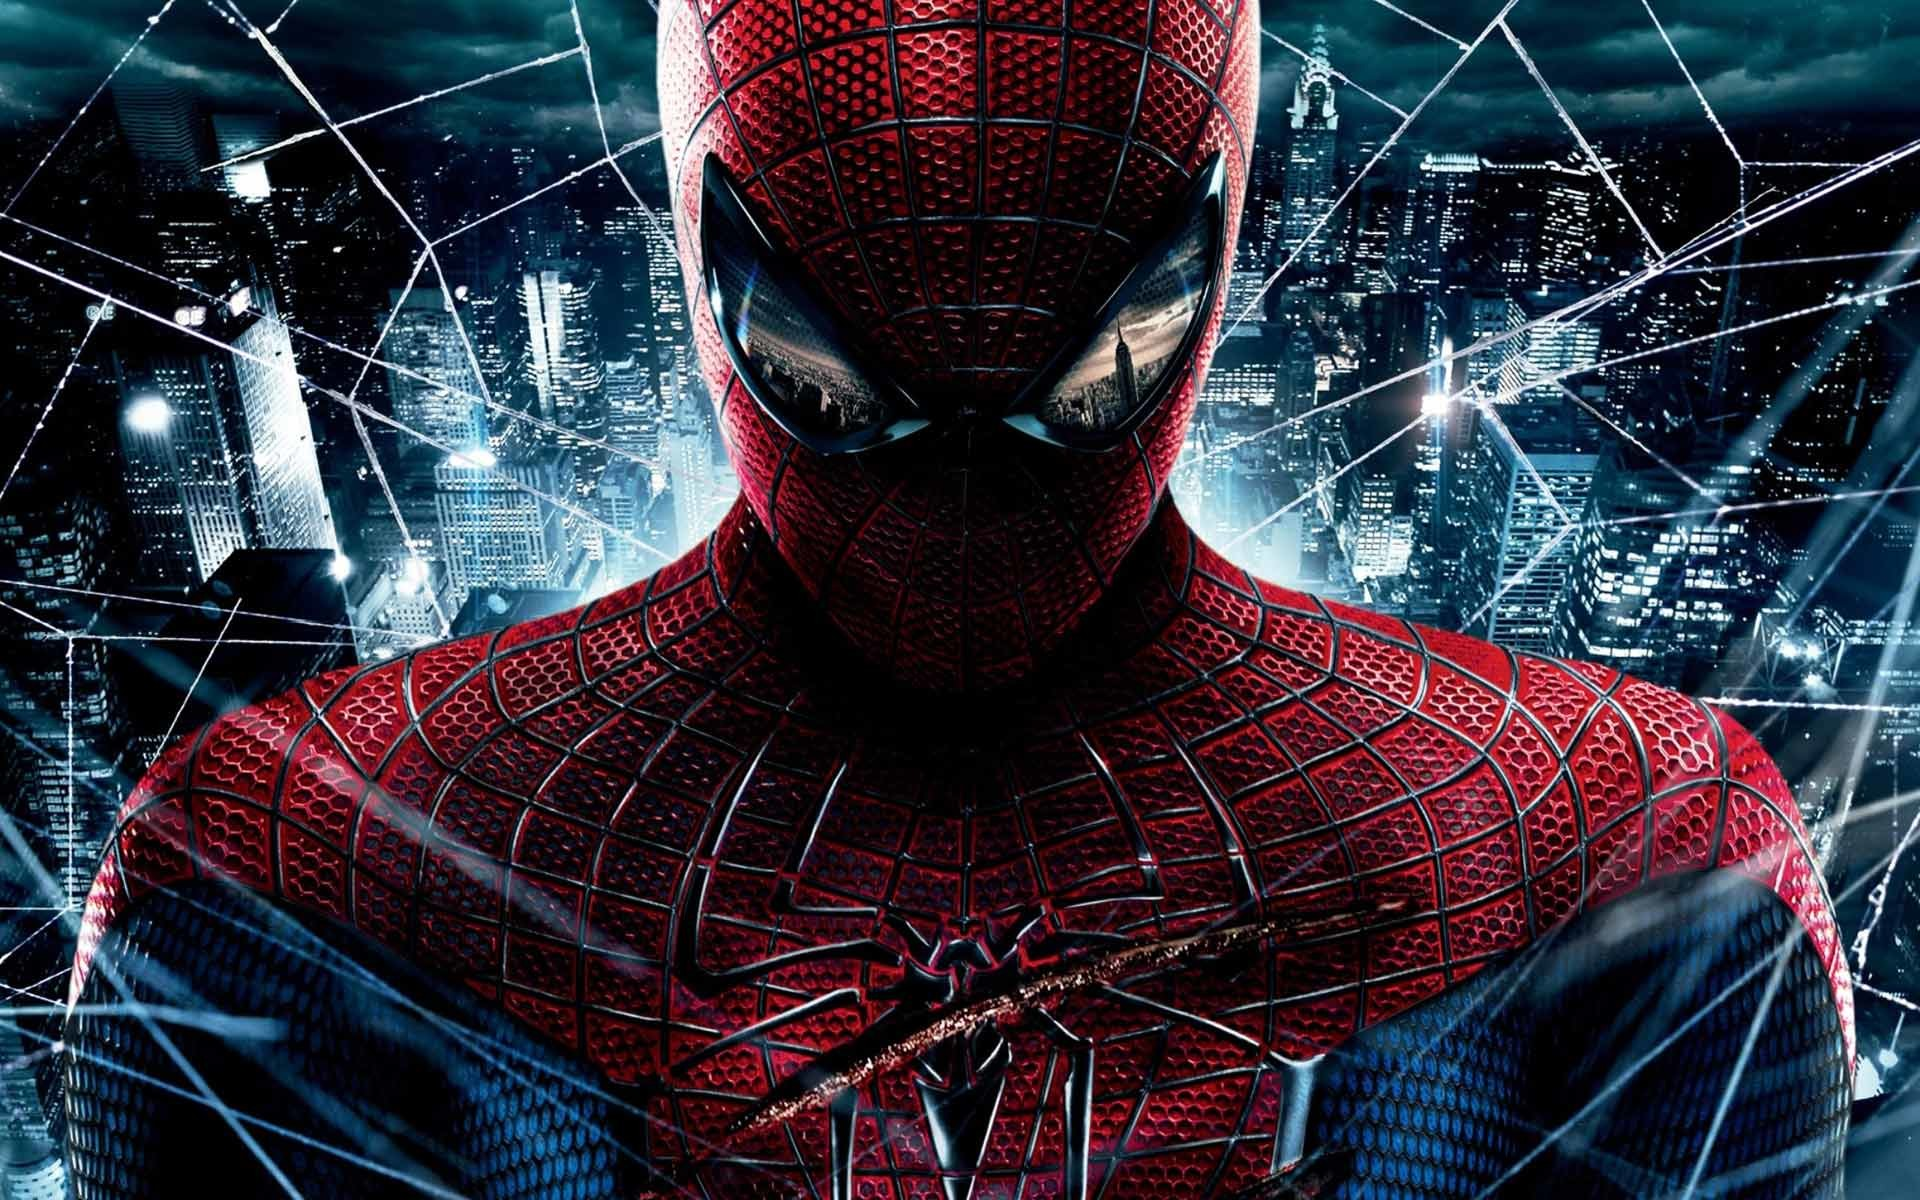 The Amazing Spider Man 2 Desktop Backgrounds.  amazing_spider_man_2_movie_wallpapers_desktop_backgrounds_the_amazing_spiderman_2014_hd_wallpapers-(6)